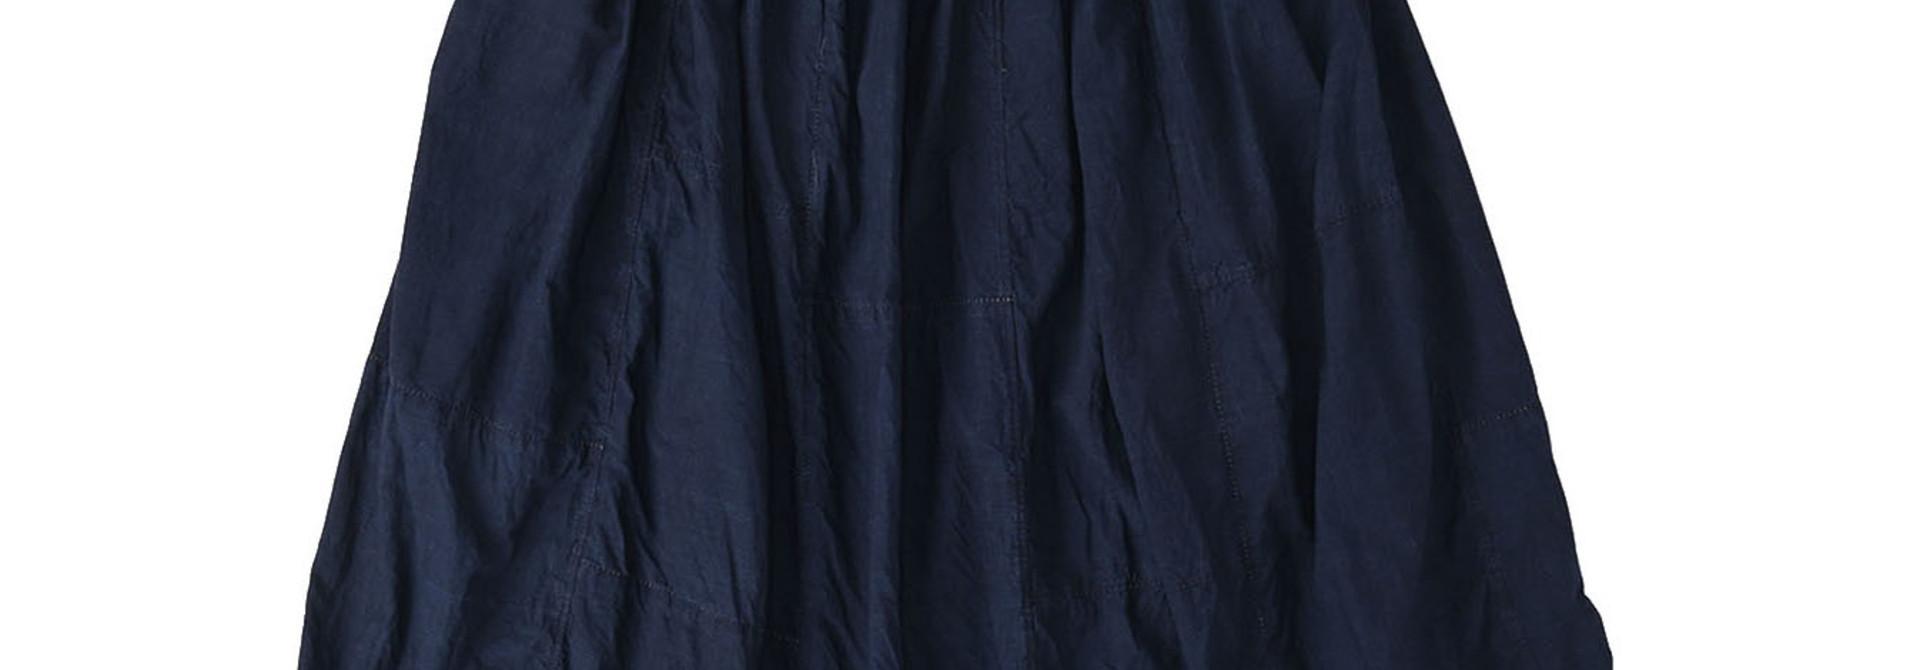 Indigo Tappet Patchwork Skirt